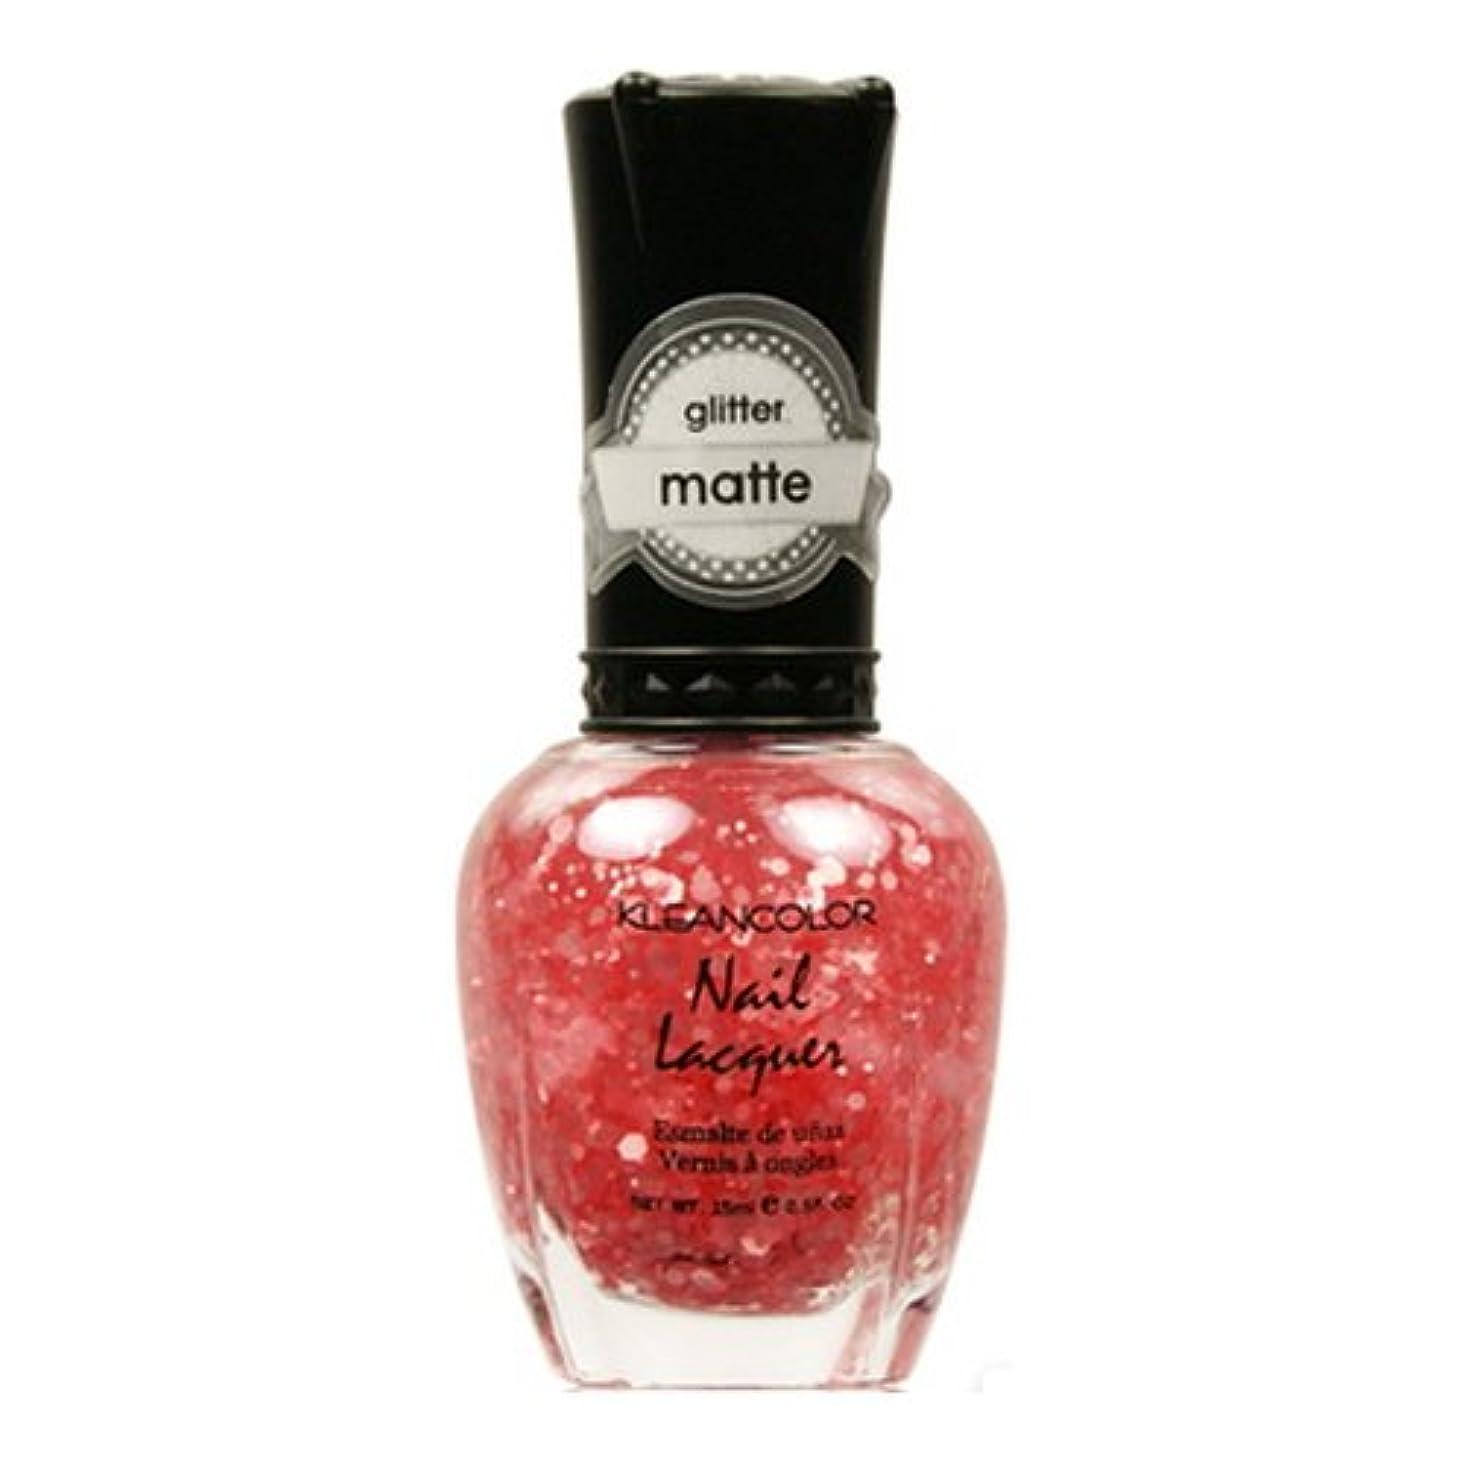 (3 Pack) KLEANCOLOR Glitter Matte Nail Lacquer - Blush Pink (並行輸入品)